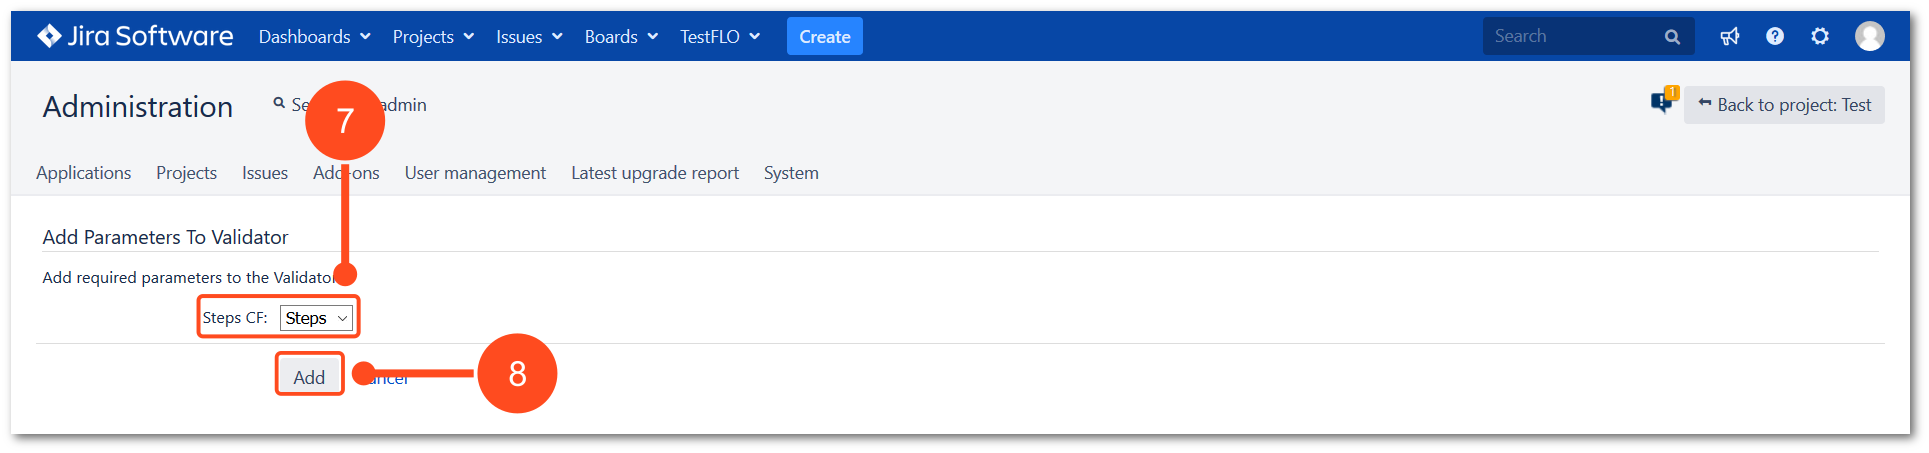 Advanced workflow validator